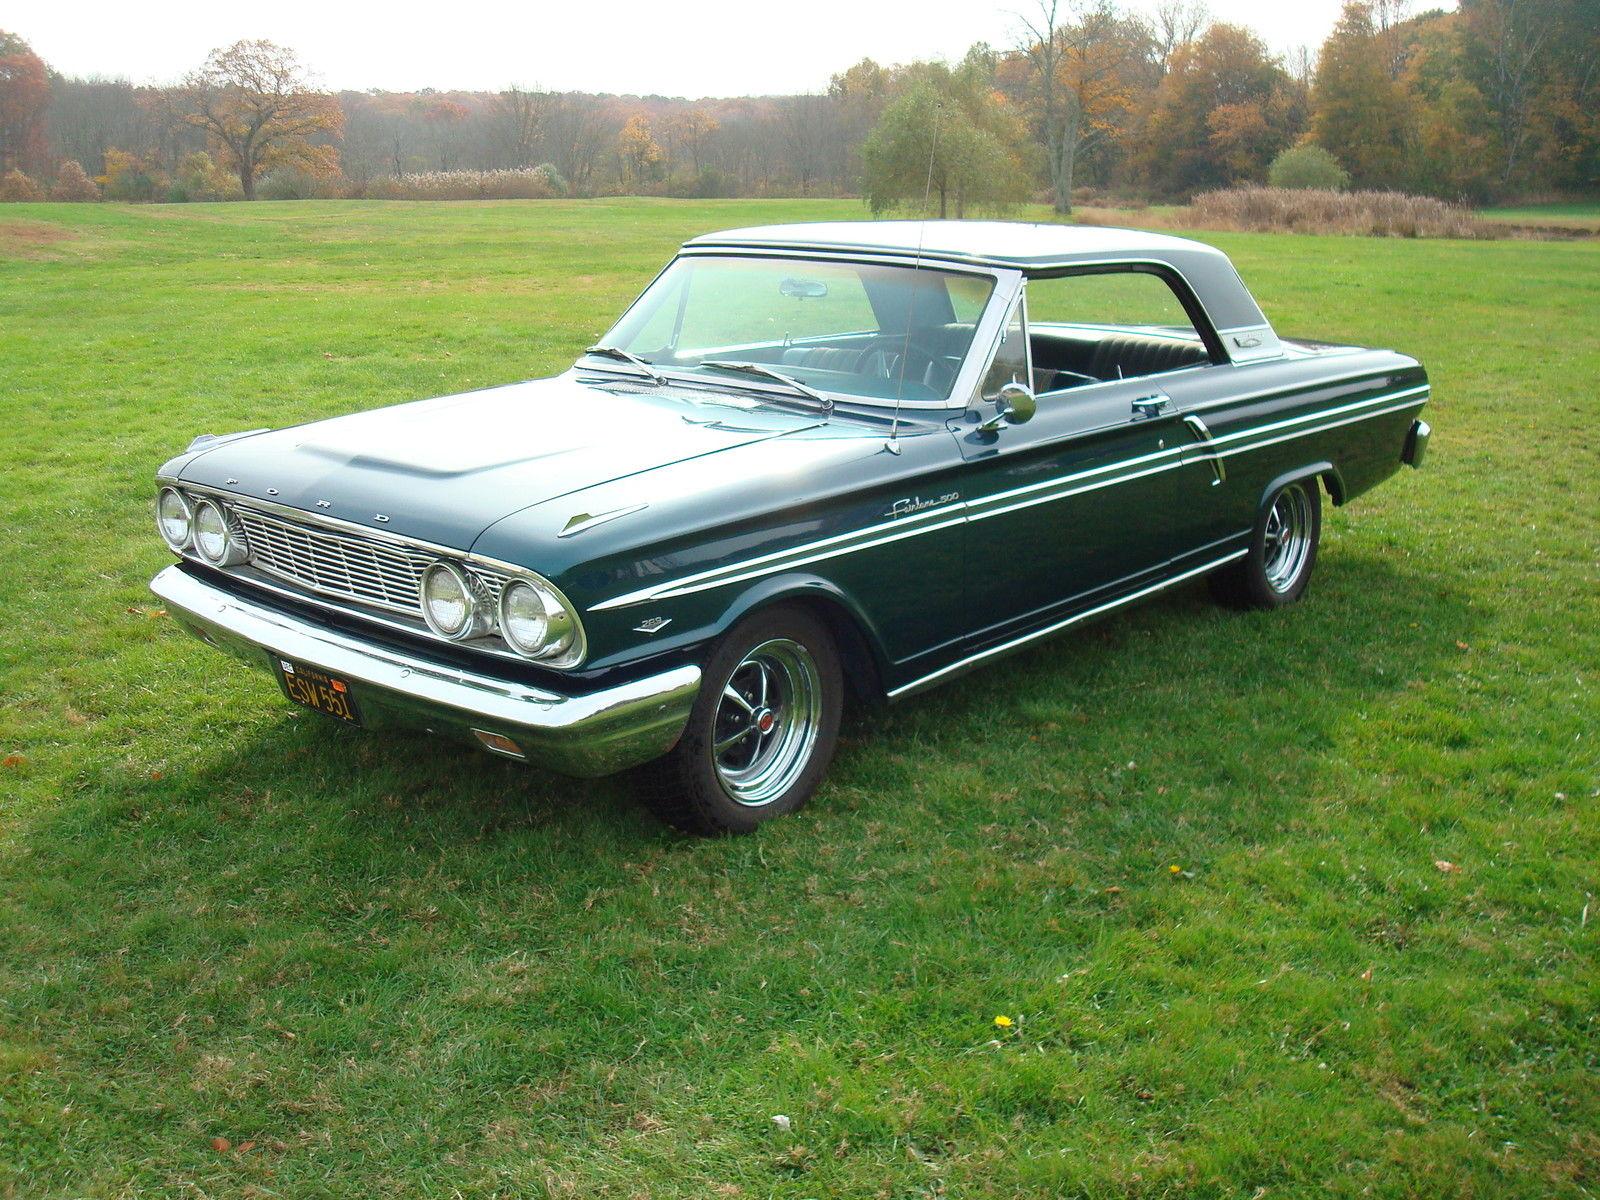 1964 Ford Fairlane 500 4 7L